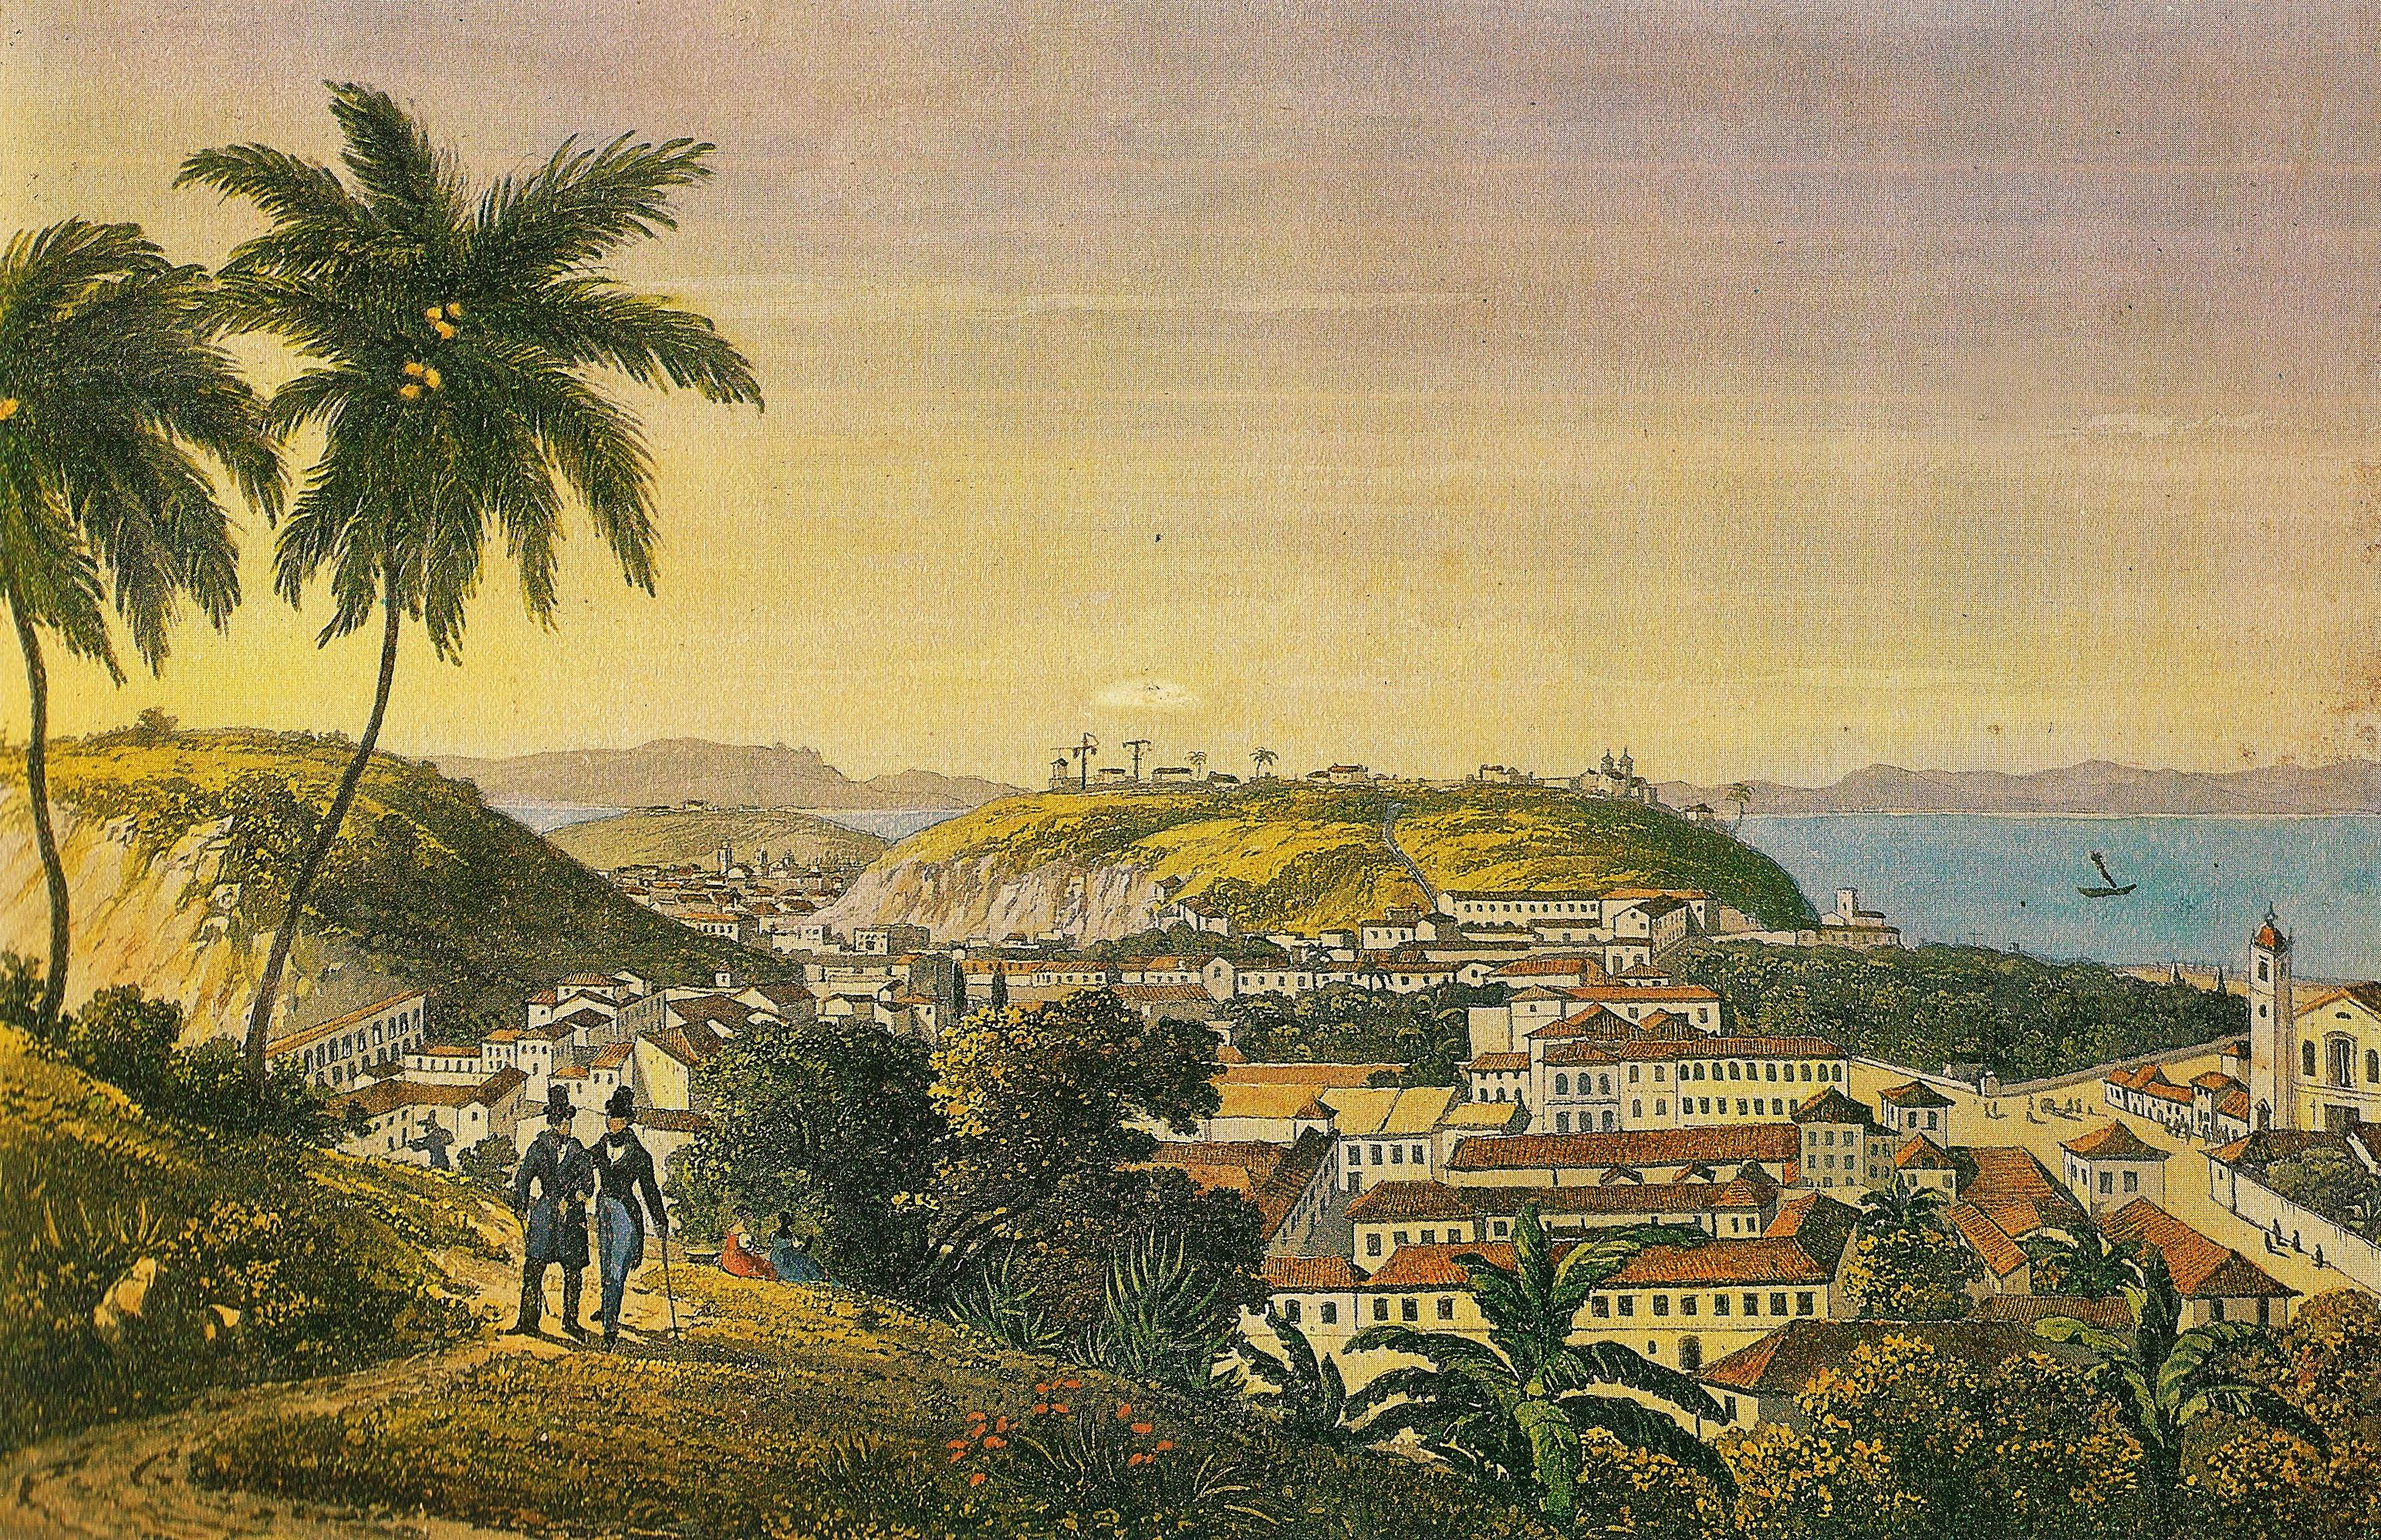 (1) Vista tomada de Sta. Tereza. Johann Jacob Steinmann. <br> Acervo da Fundação Biblioteca Nacional - Brasil